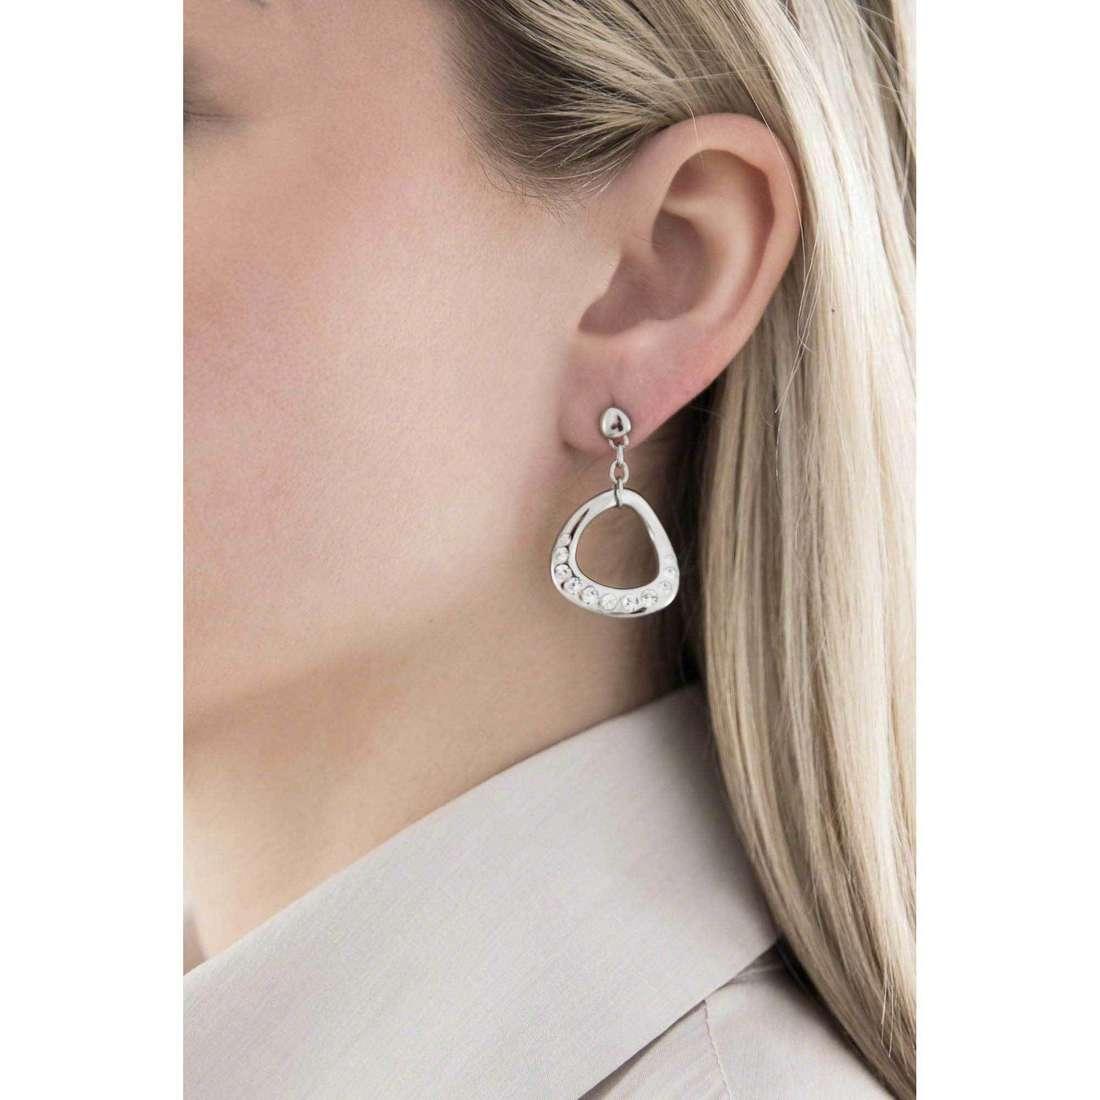 Morellato boucles d'oreille Senza fine femme SKT08 indosso